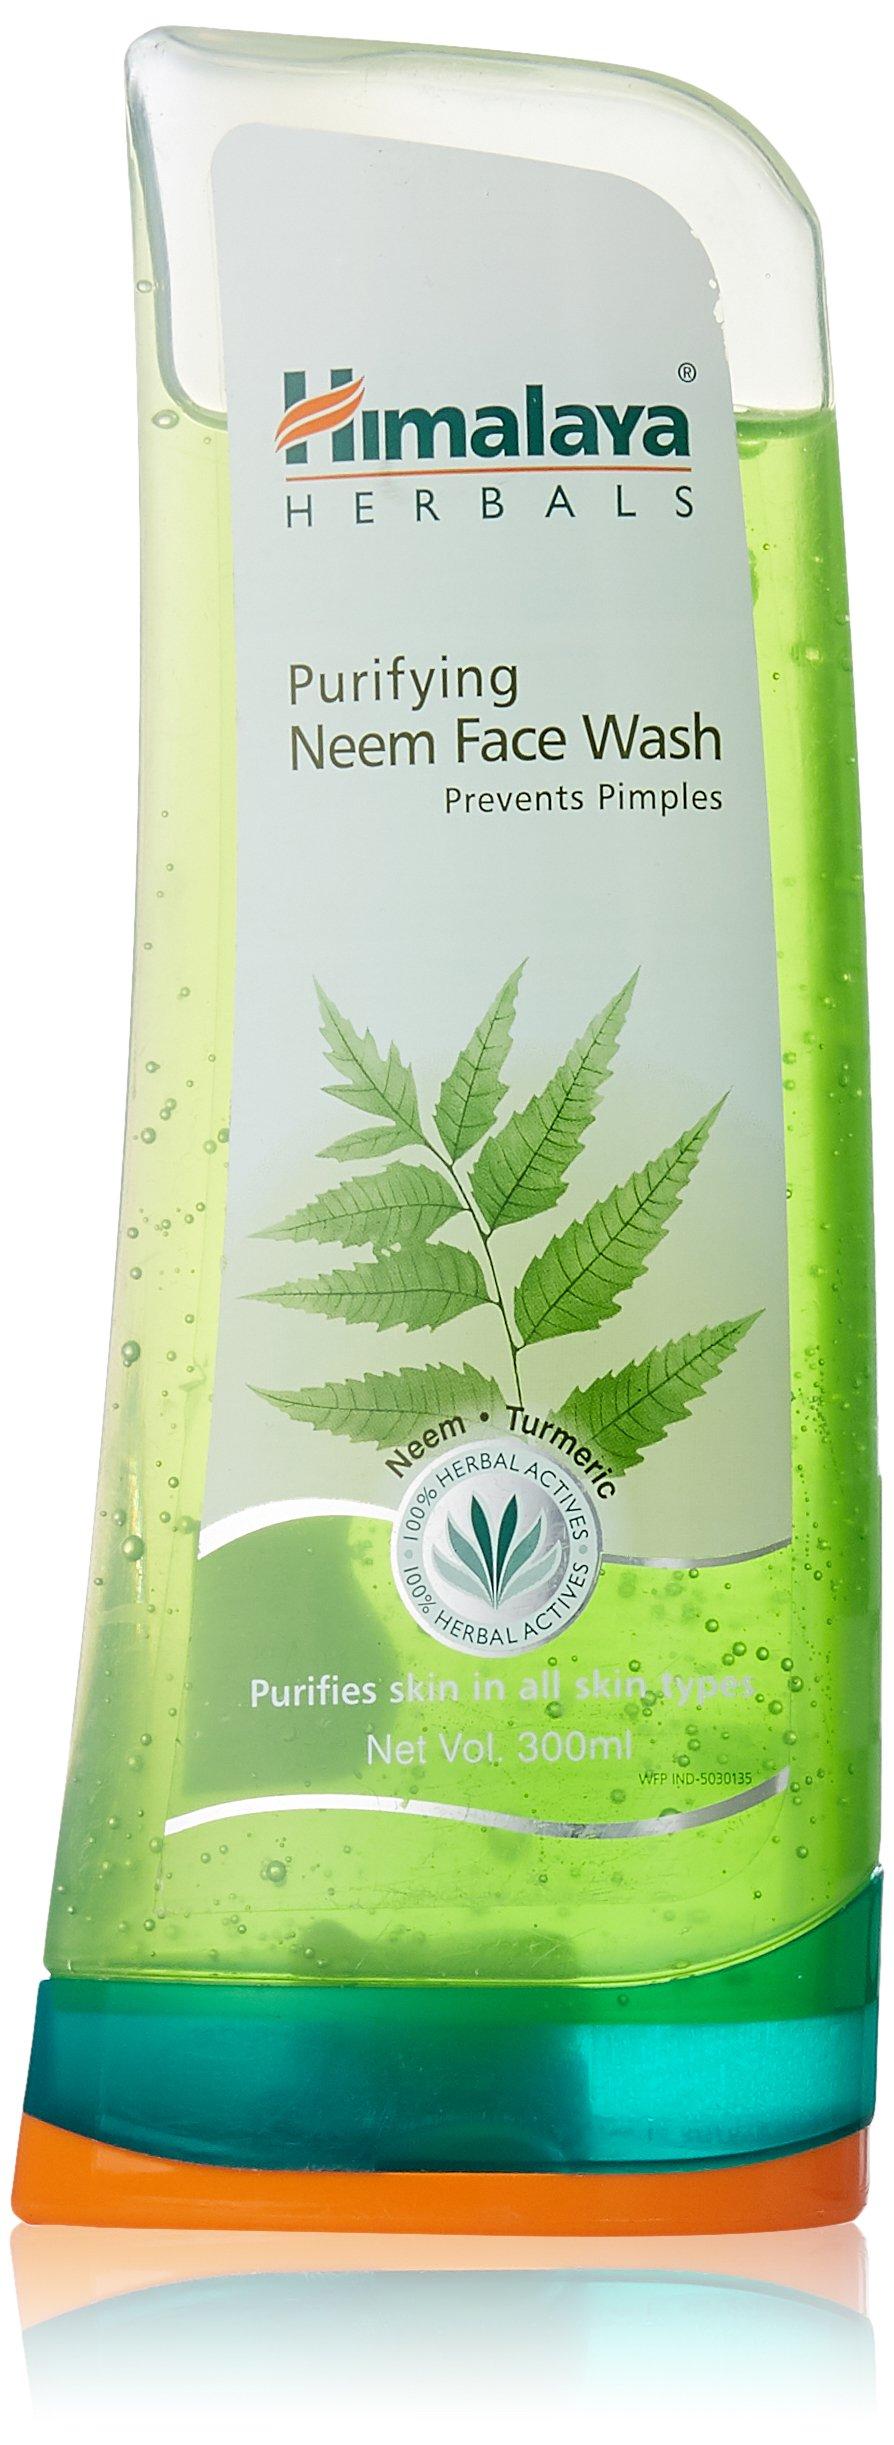 Himalaya Herbals Purifying Neem Face Wash, 300ml product image